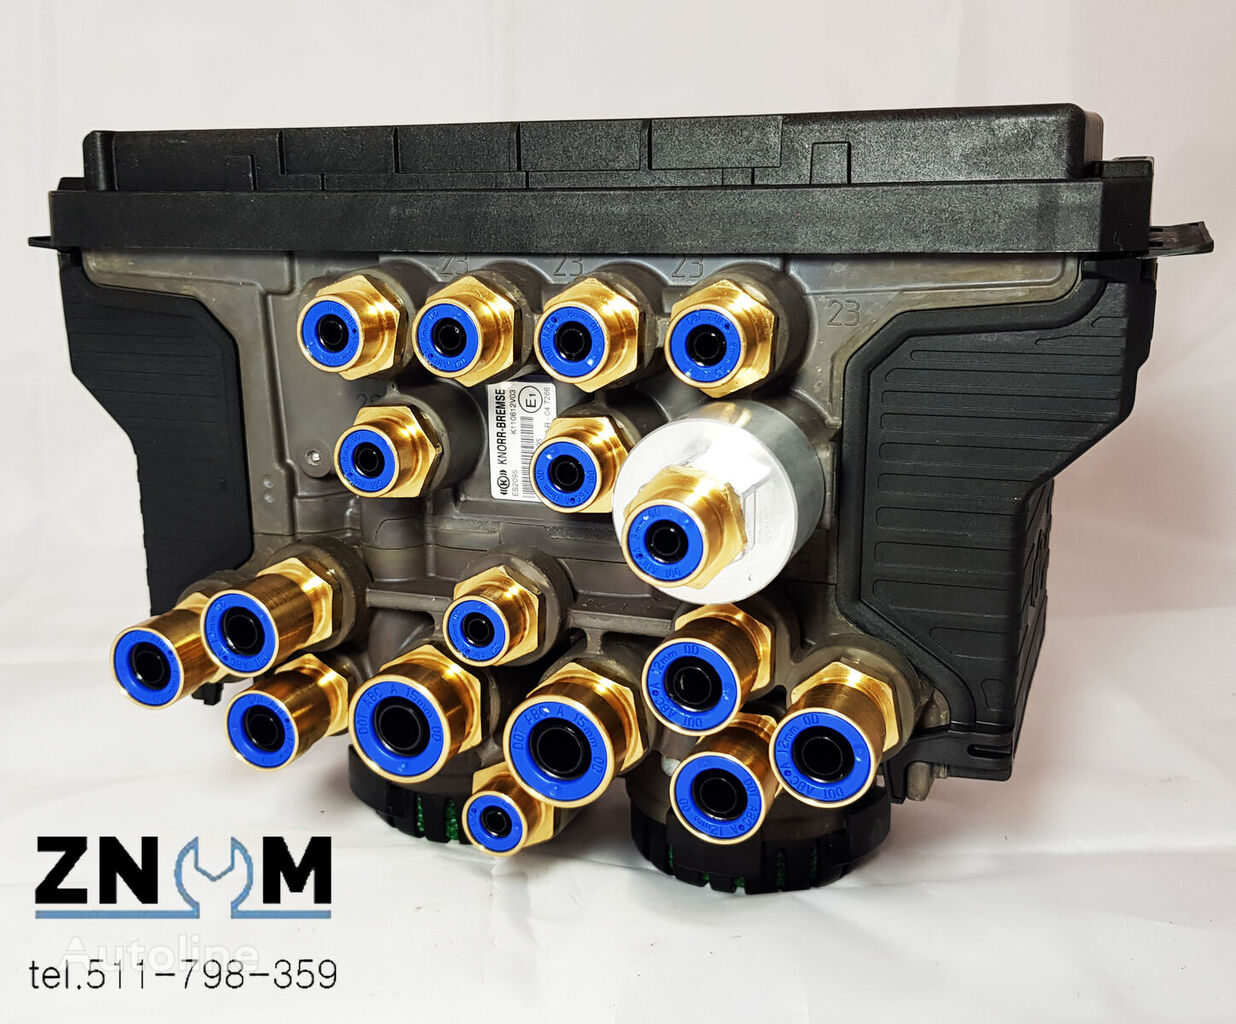 novi KNORR-BREMSE EBS modulator za KNORR-BREMSE poluprikolica